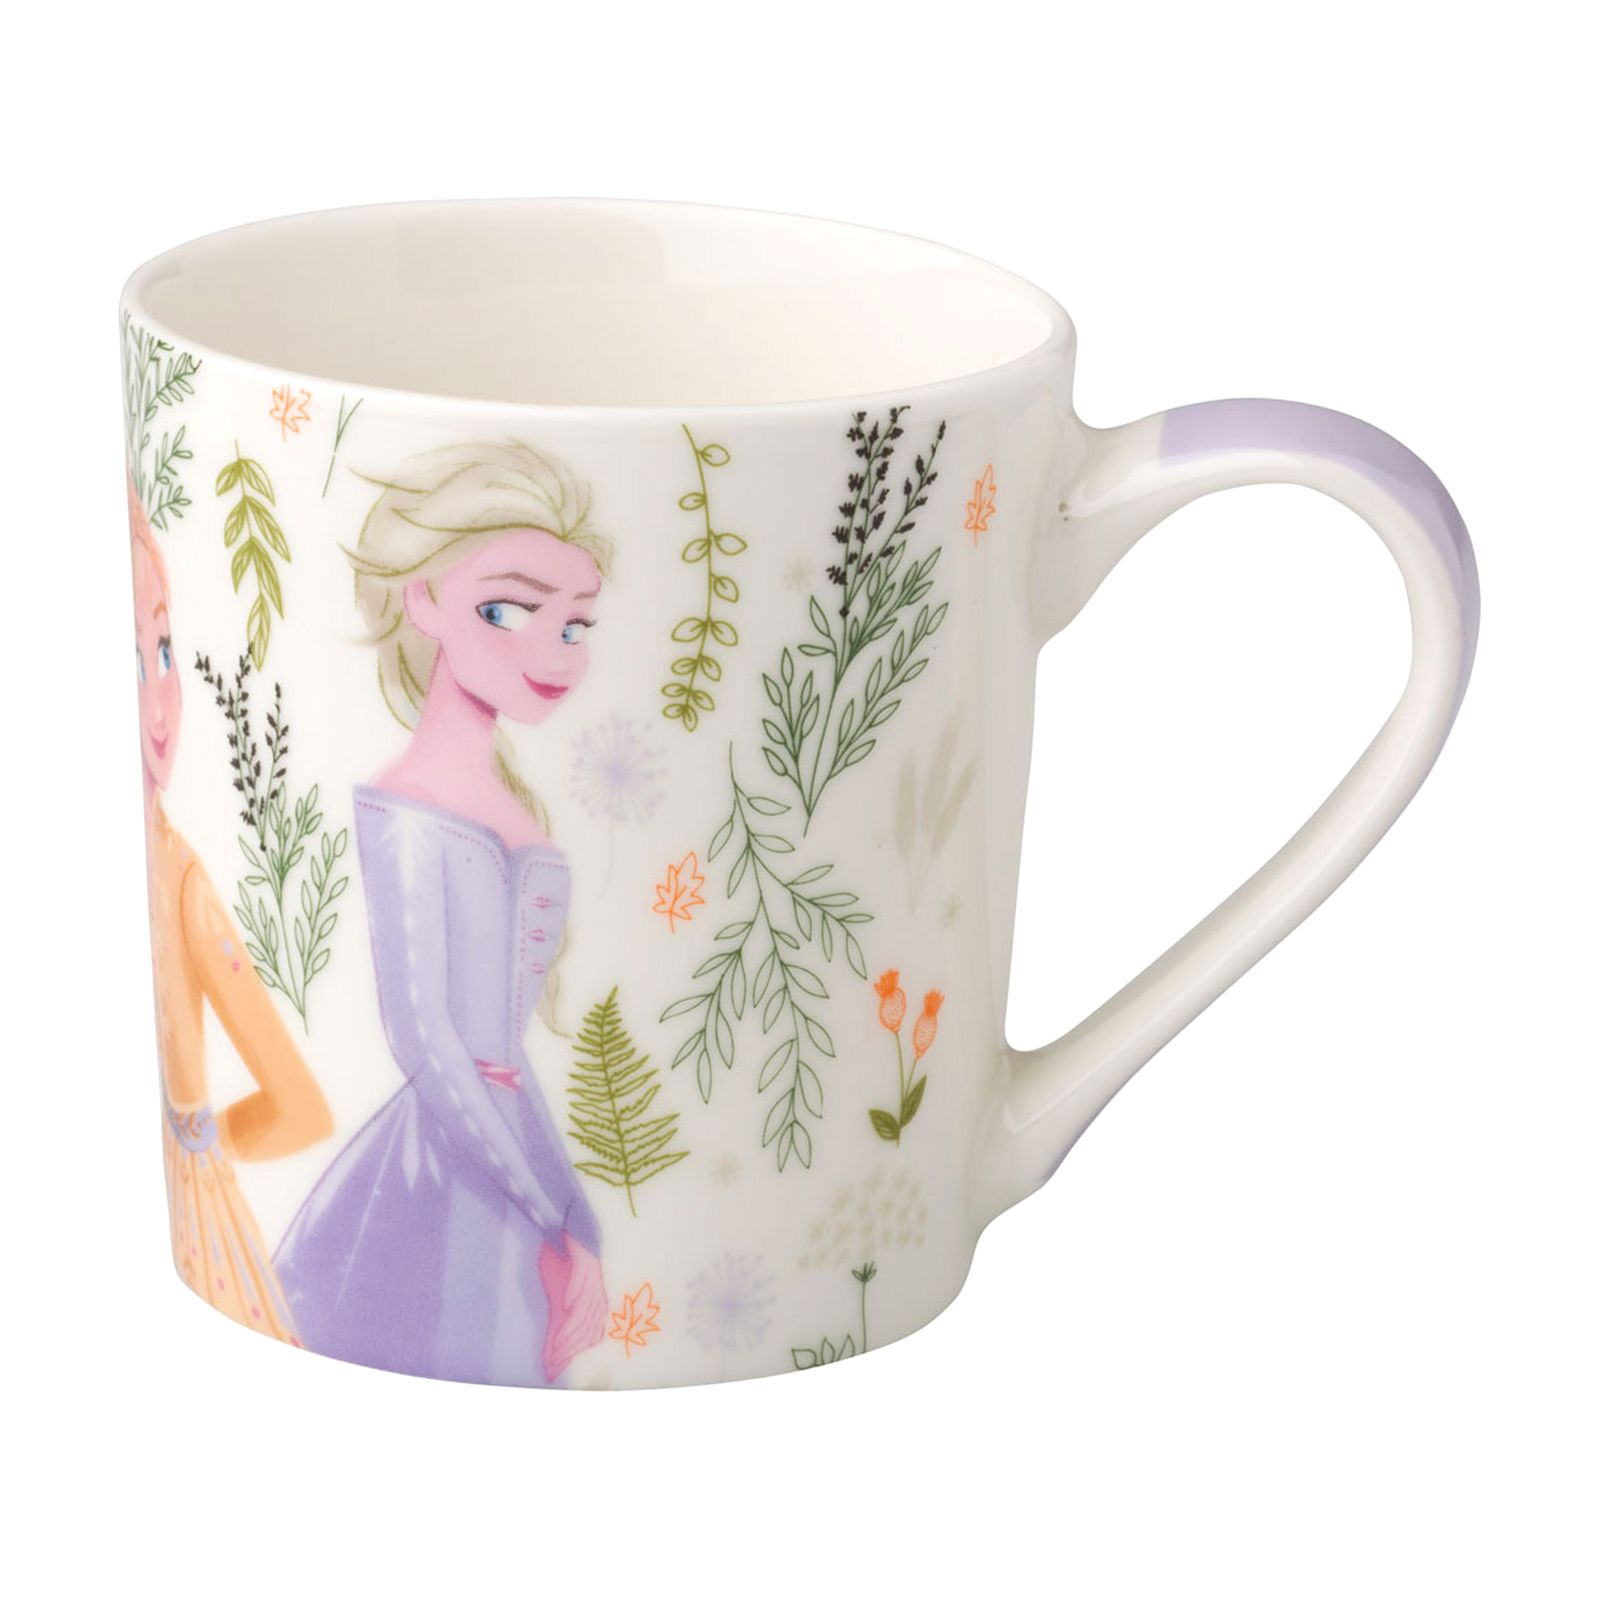 Porcelain mug Frozen II Herbal 280 ml DISNEY